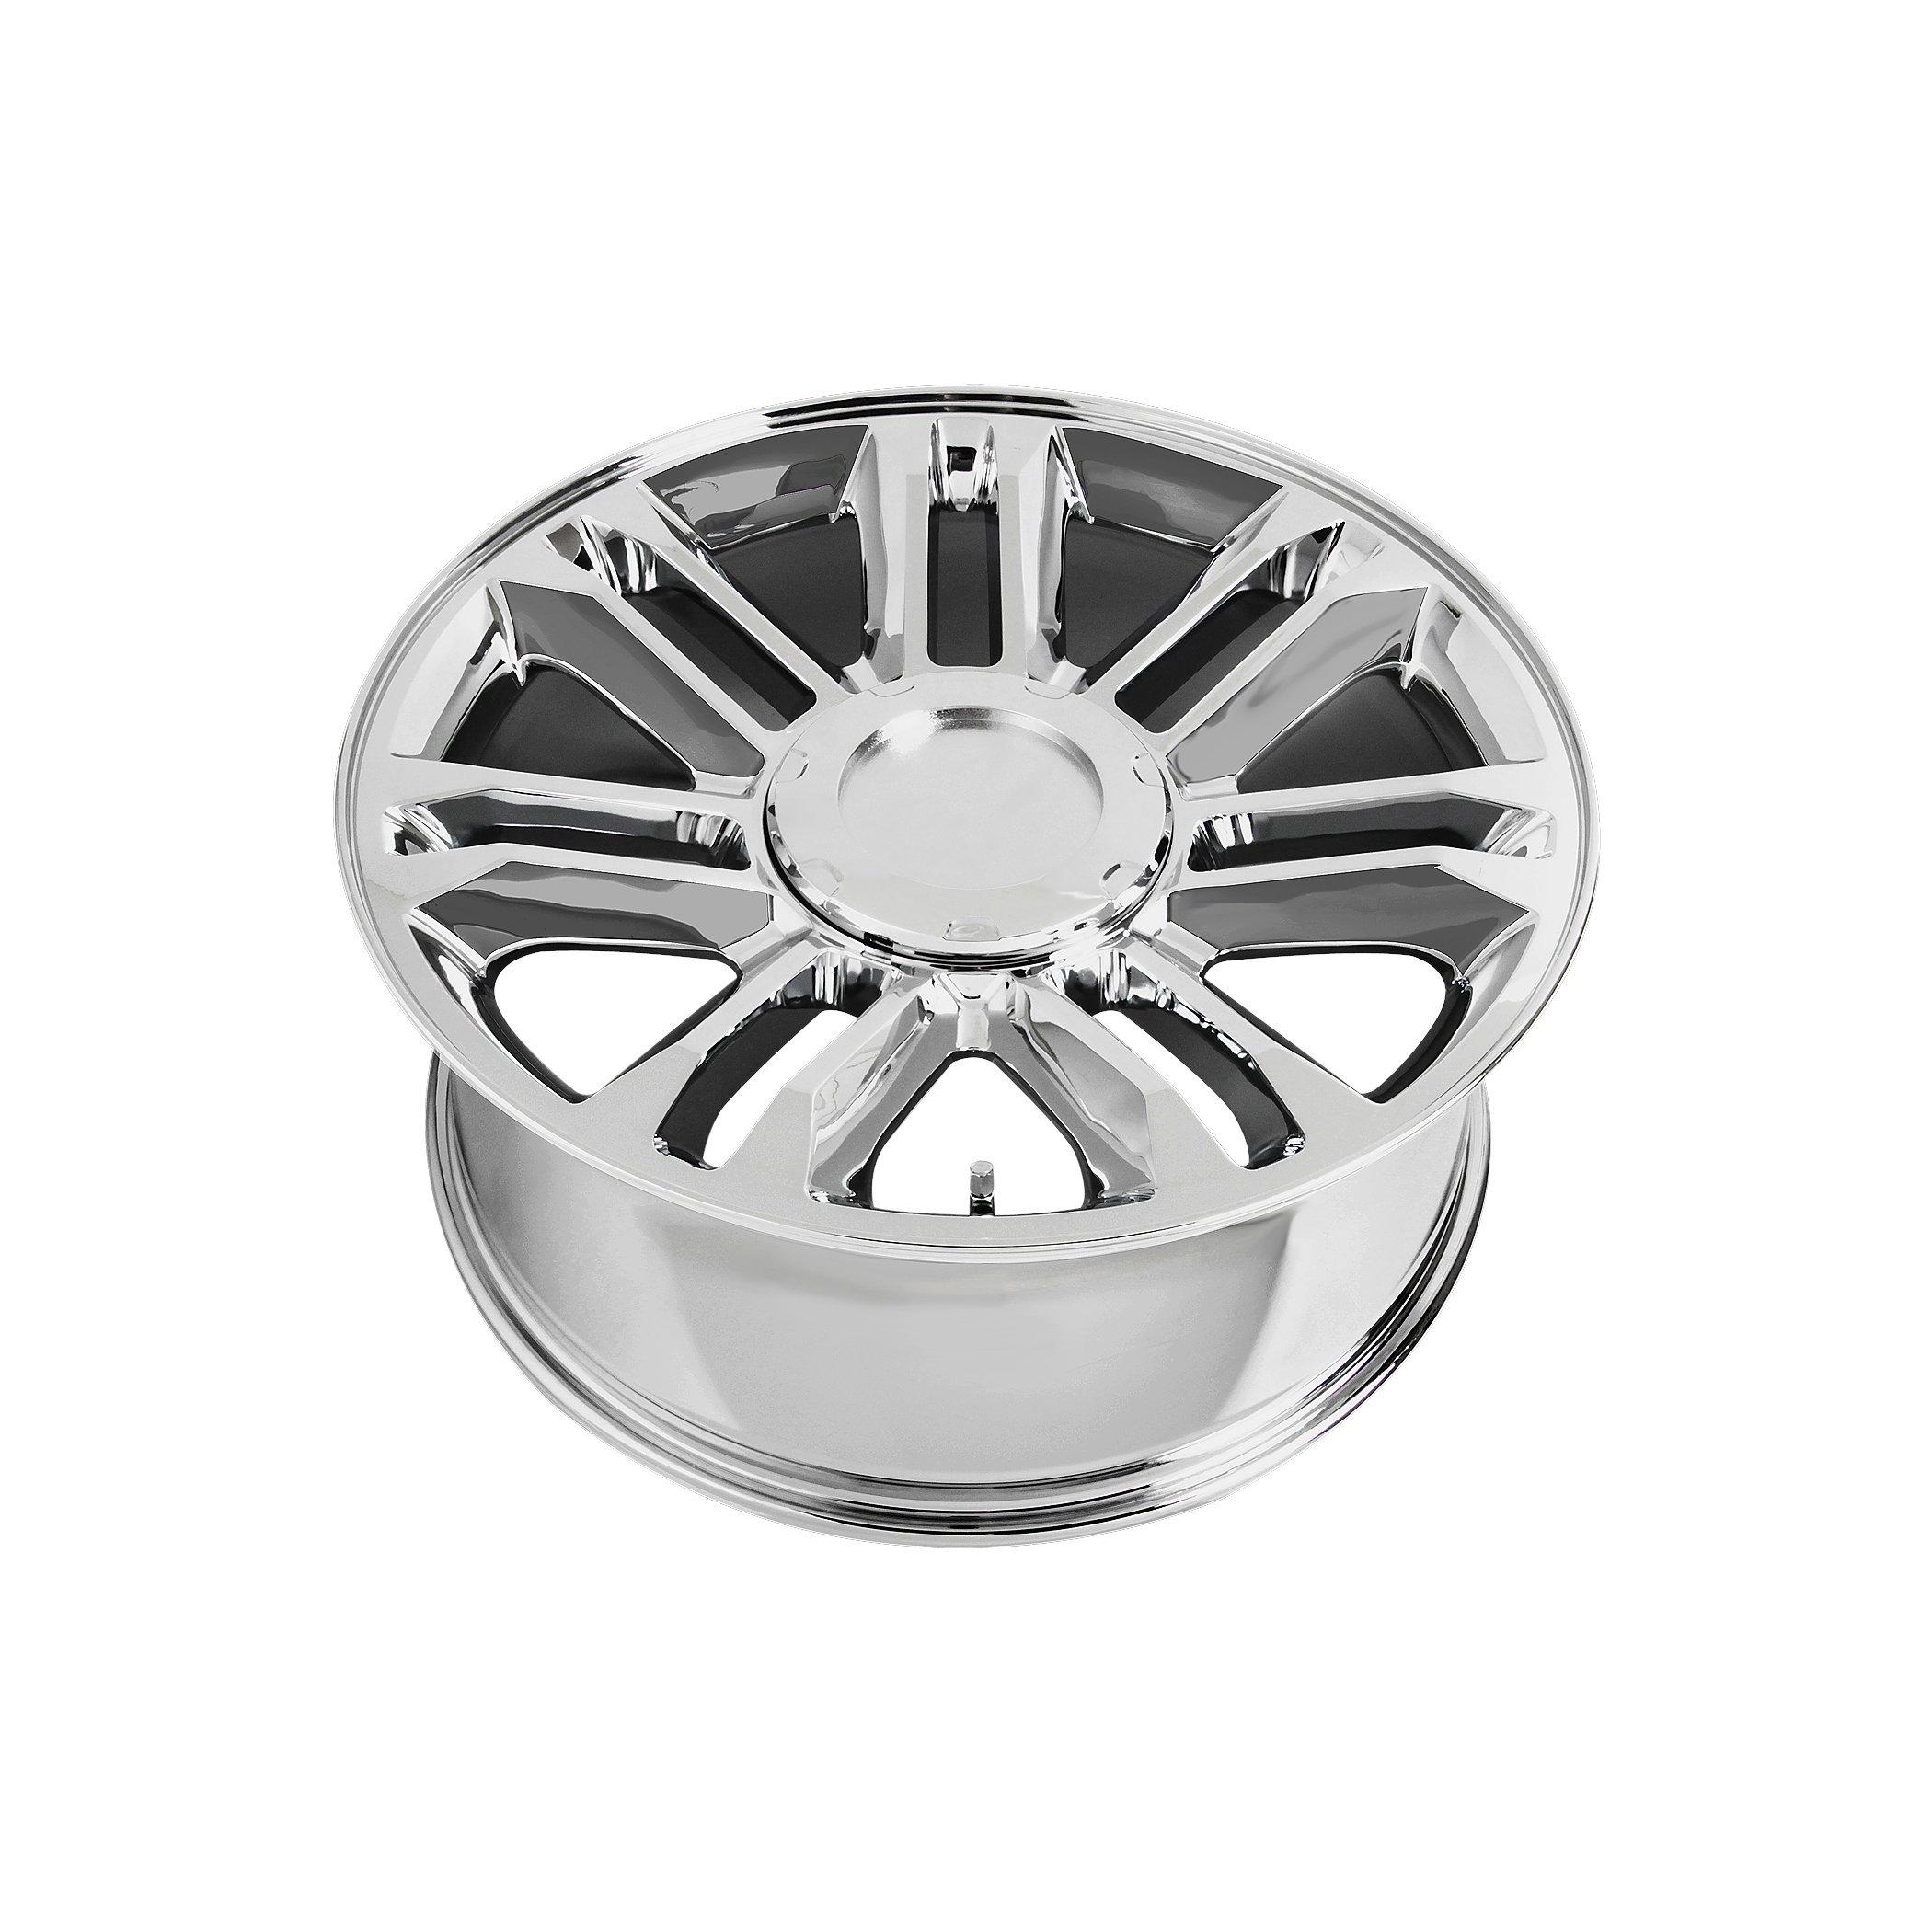 Wheel Replicas V1165 Chrome Wheel (24x10''/6x5.5'') by Wheel Replicas (Image #2)